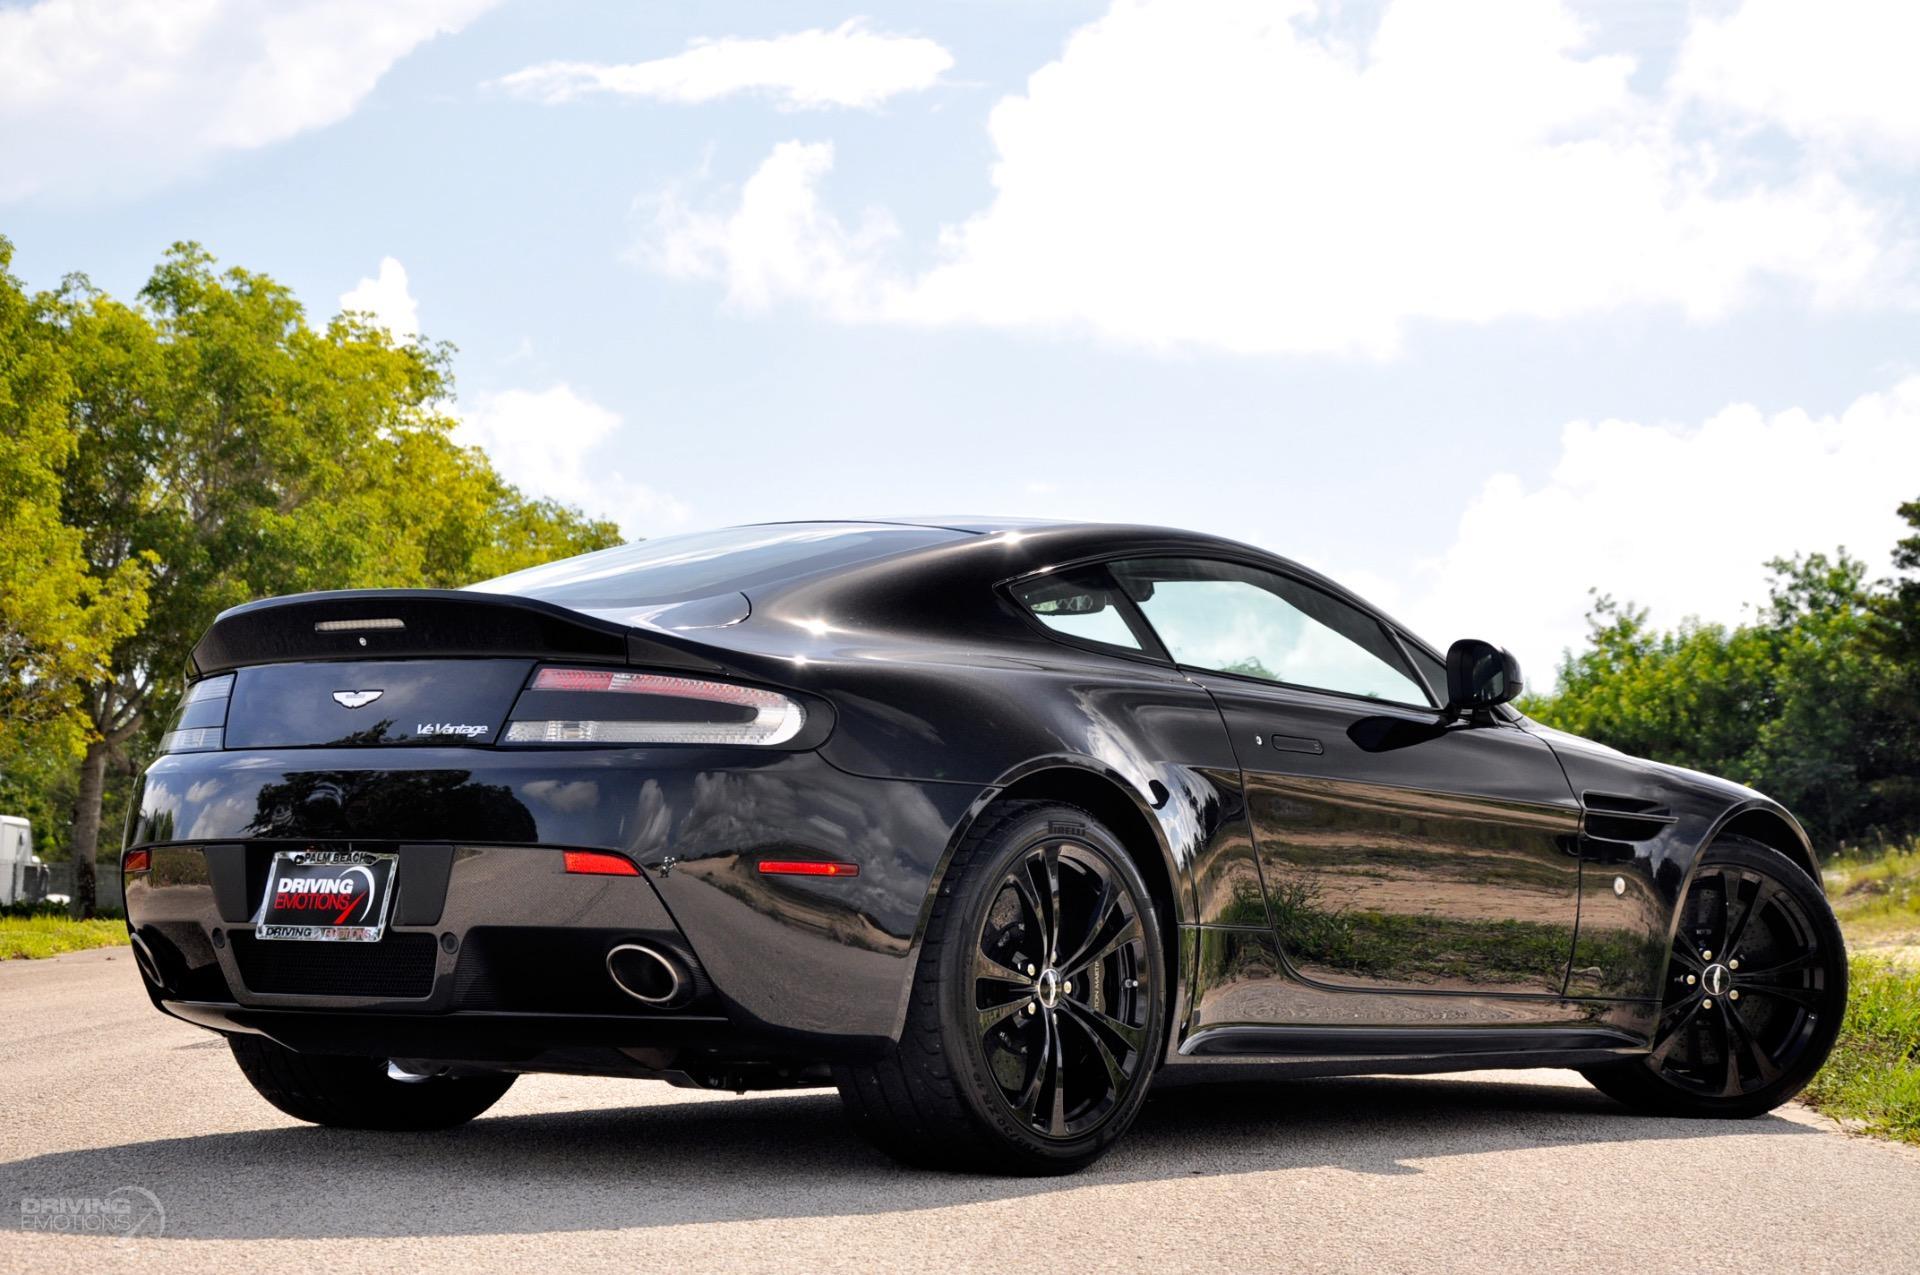 2012 Aston Martin V12 Vantage V12 Carbon Black Stock ...